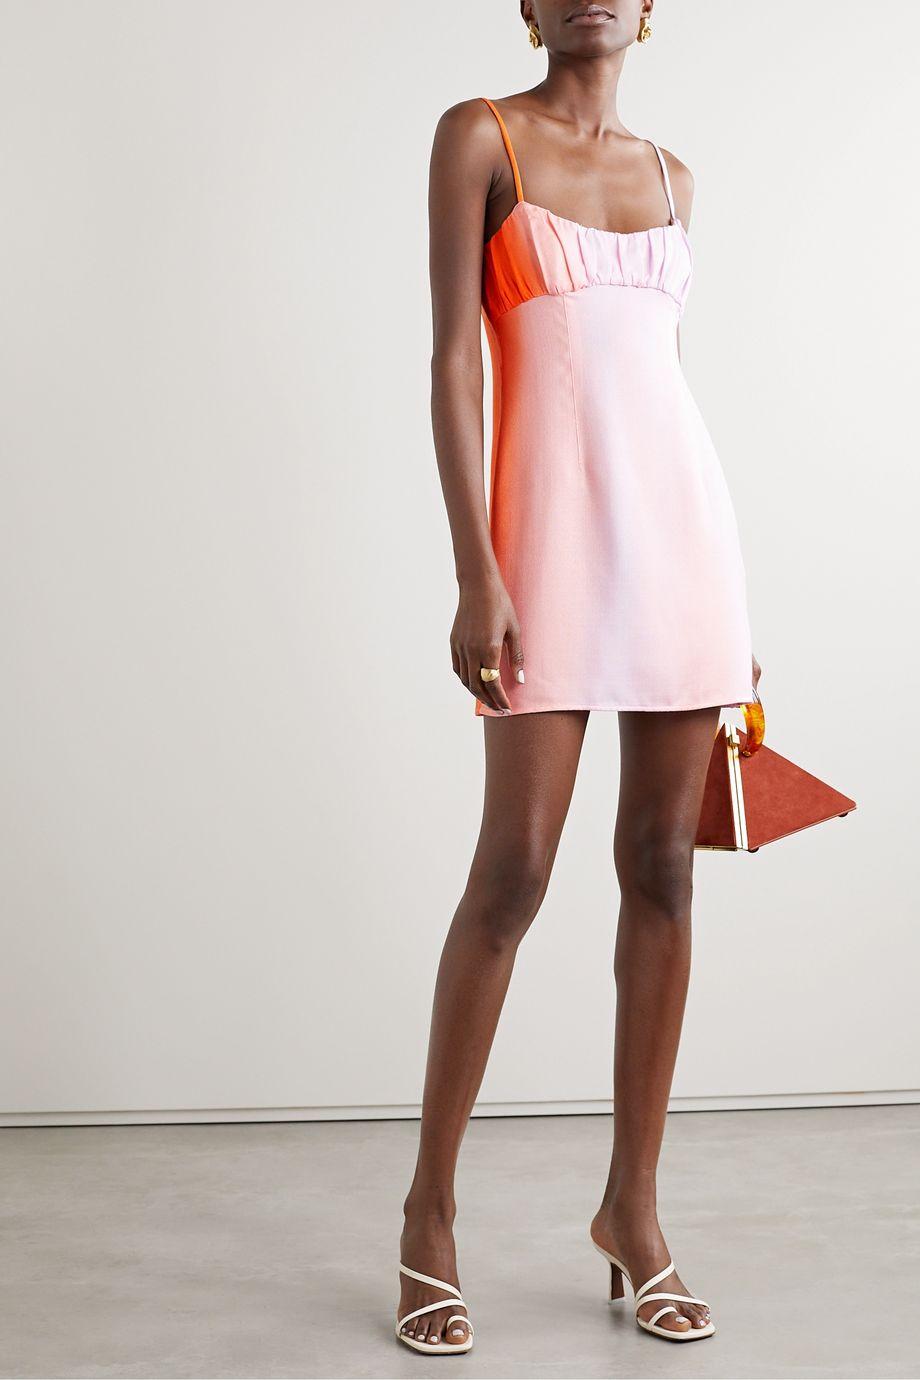 Maggie Marilyn + NET SUSTAIN Powder Sunset ruched dégradé Tencel mini dress